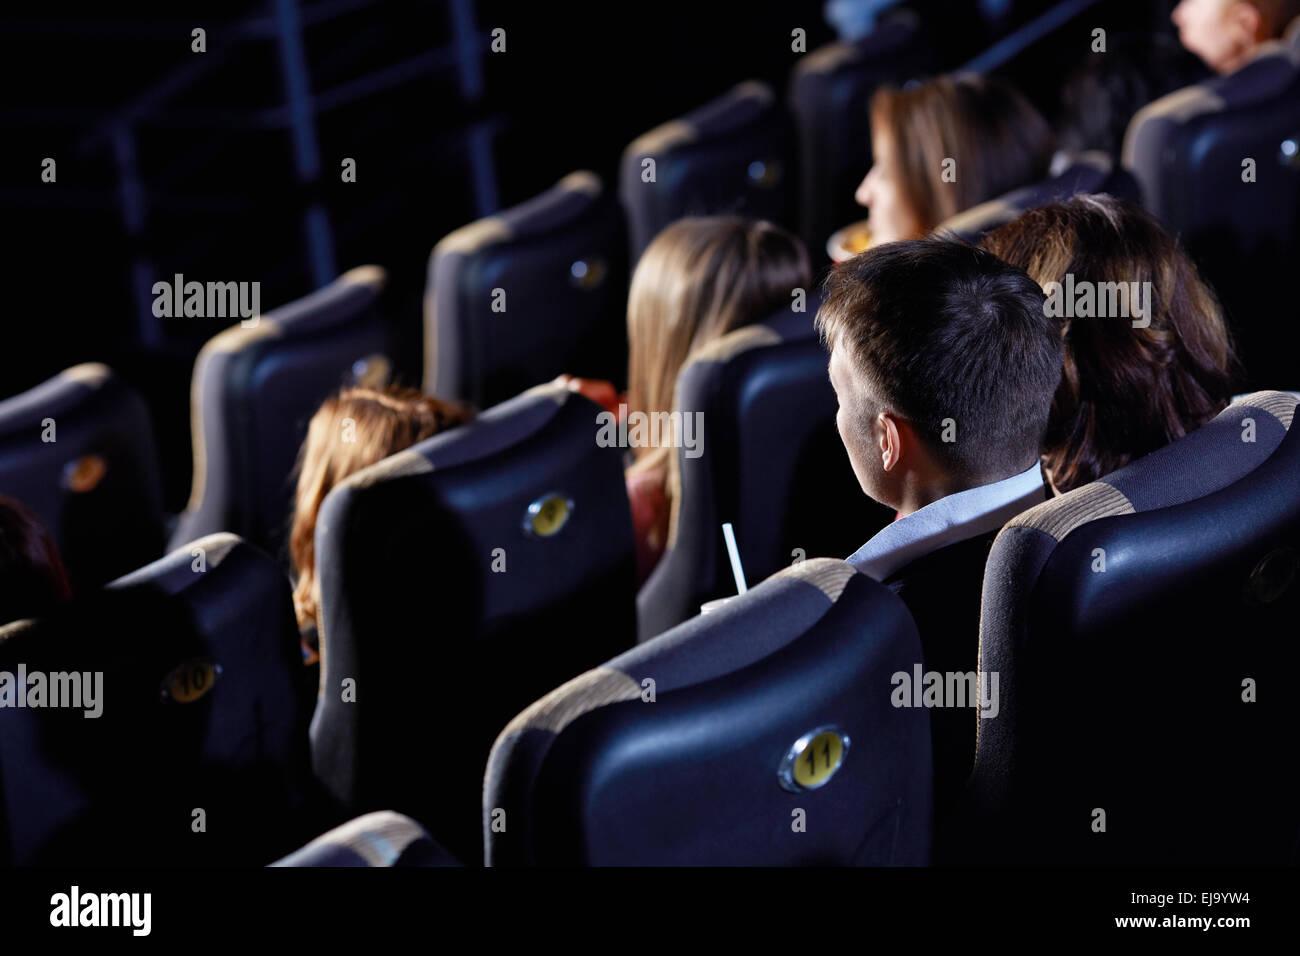 Sala cinema Immagini Stock